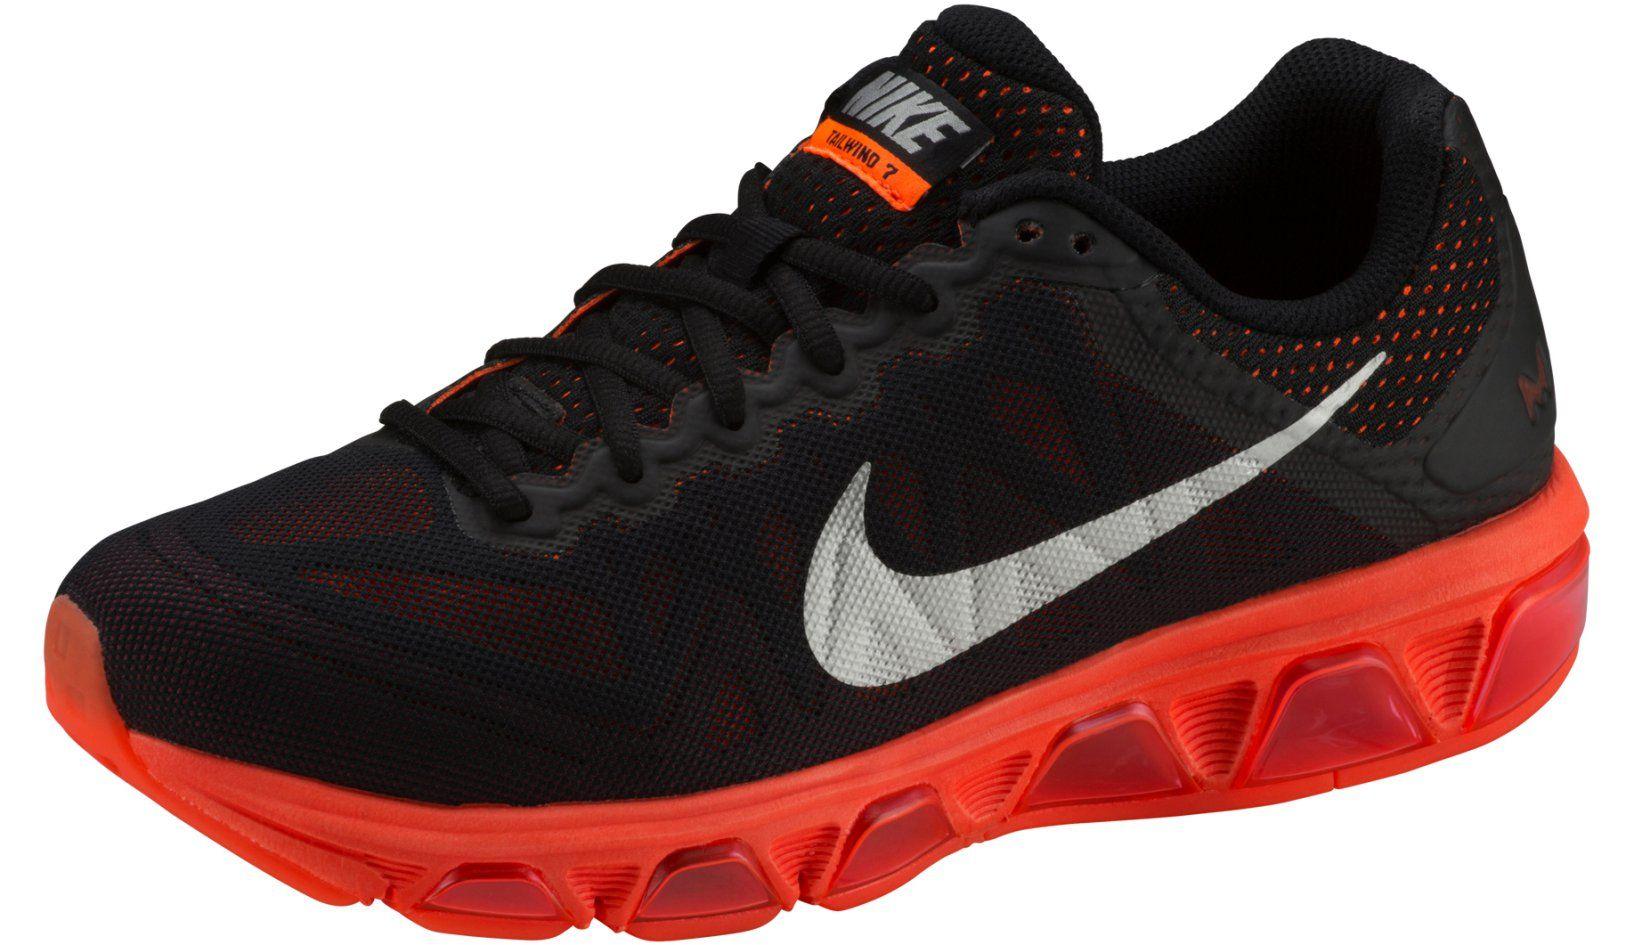 chaussures de sport 87cd2 ba816 Shoes1 | Nike Air Max | Nike air max plus, Sneakers nike ...